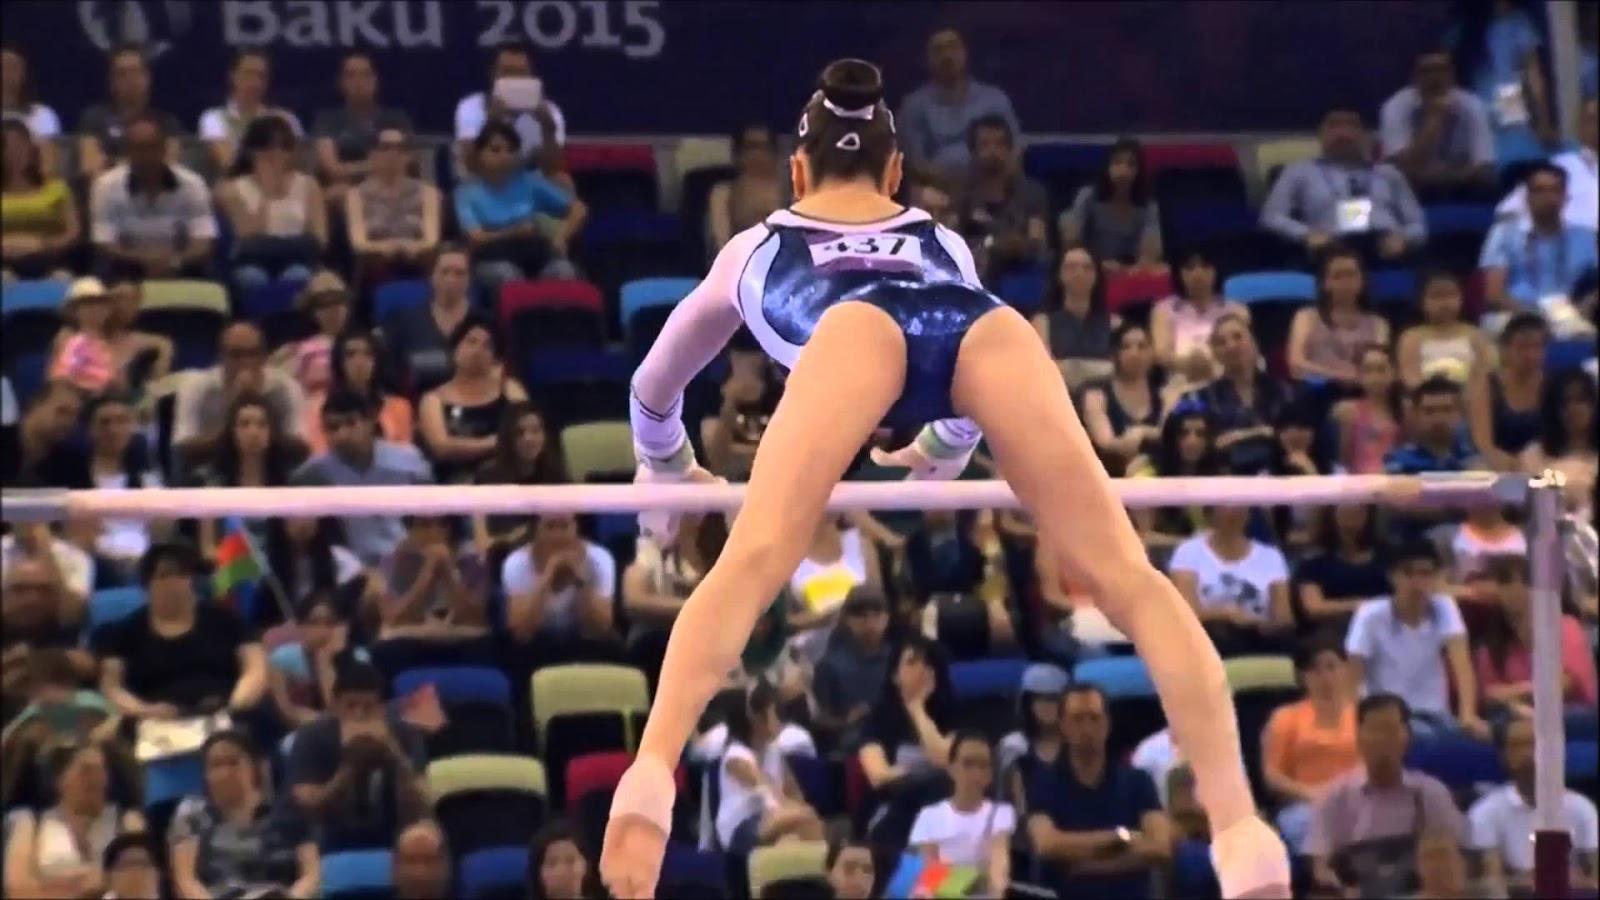 Rio Olympics 2016 Gymnastics Schedule   IPL 2017   ipl live streaming ...